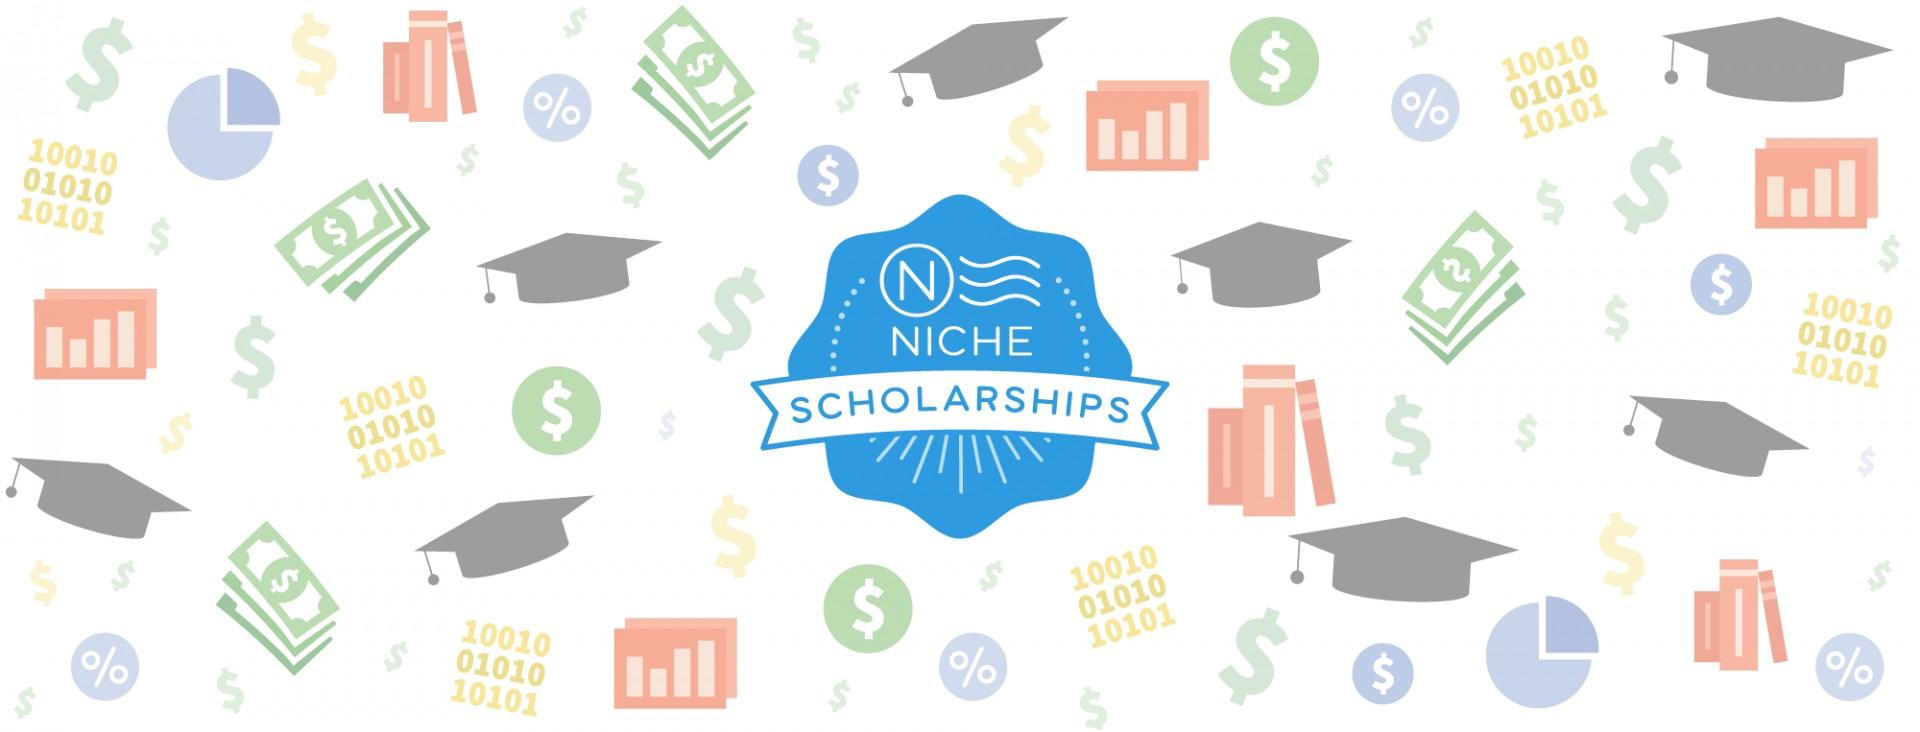 003 Niche No Essay Scholarship Example Marvelous Reddit Winners 1920